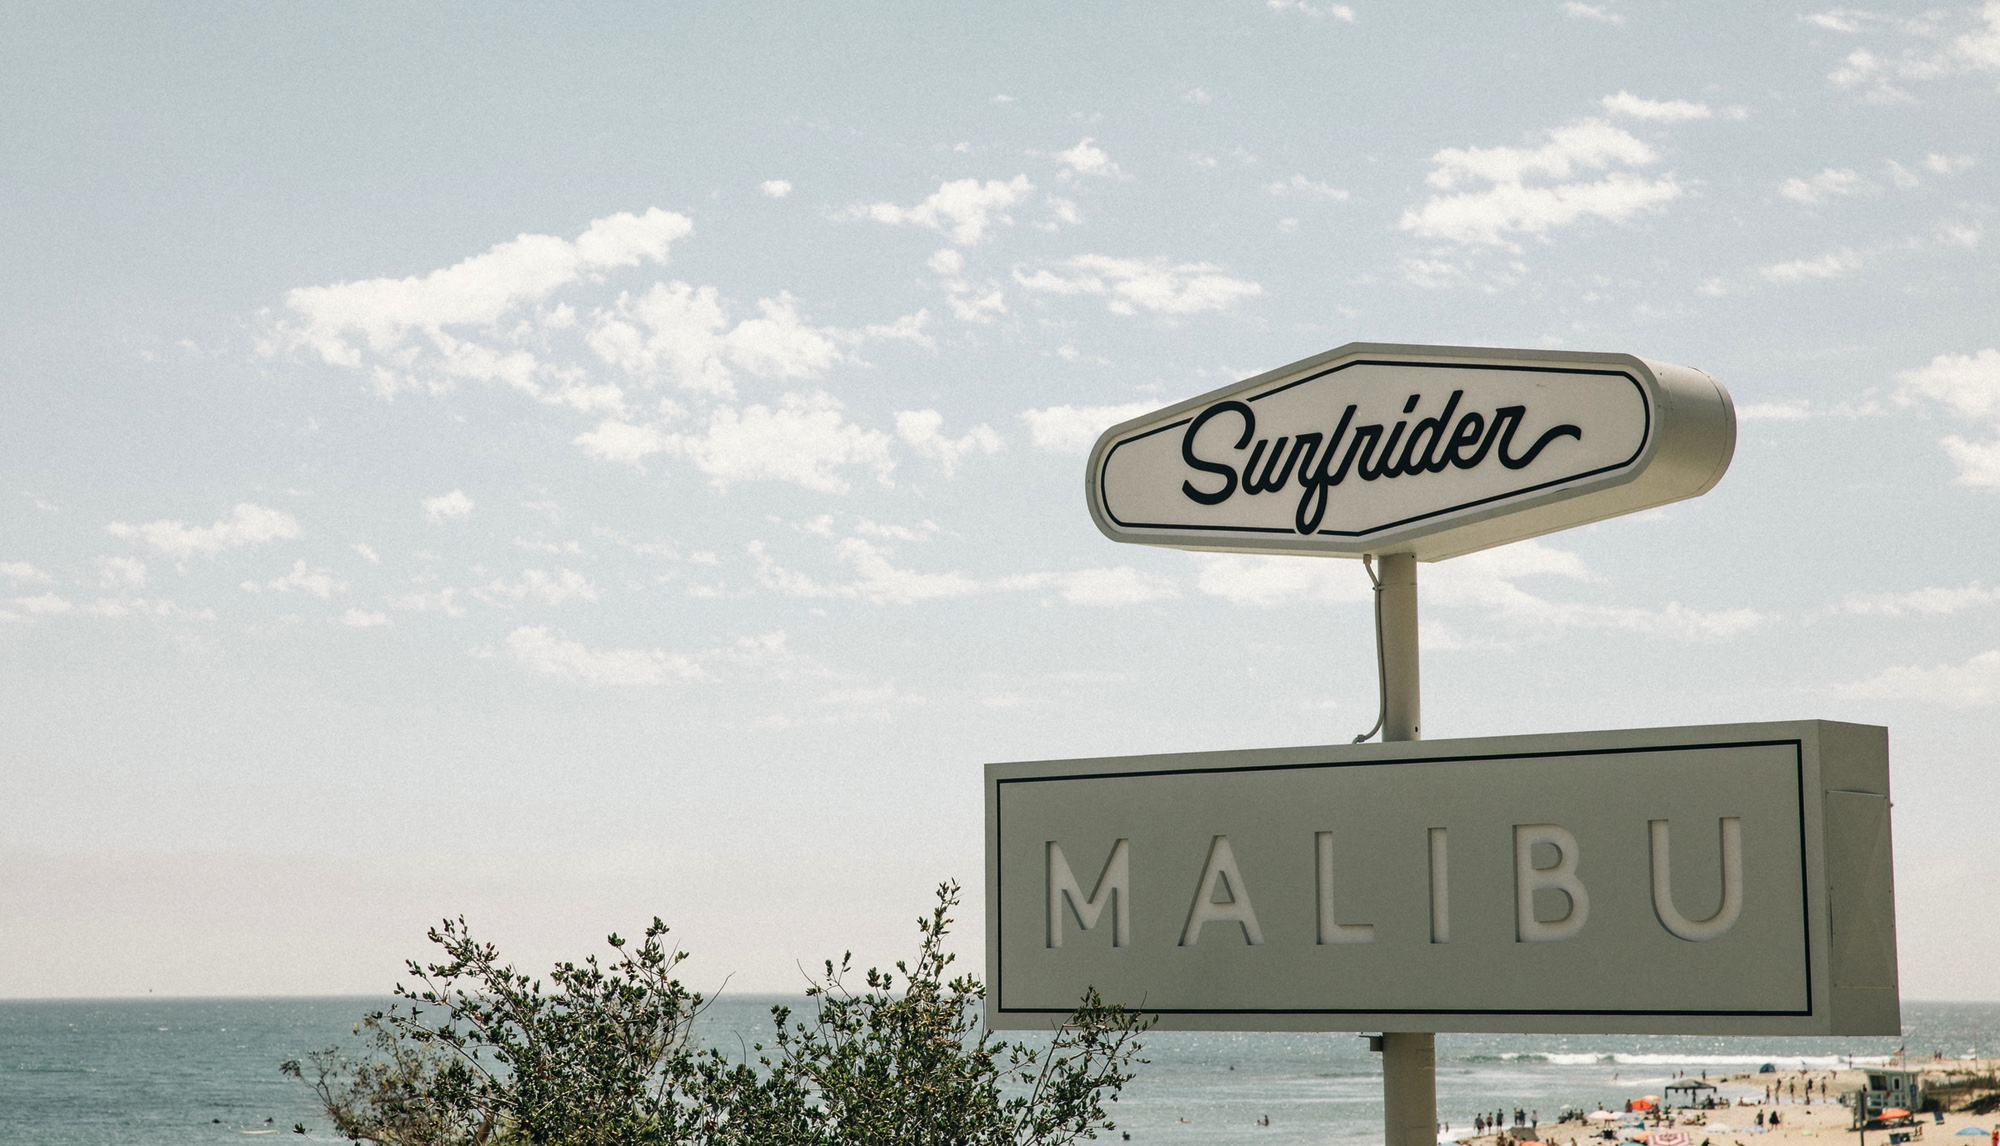 The Surfrider, Malibu